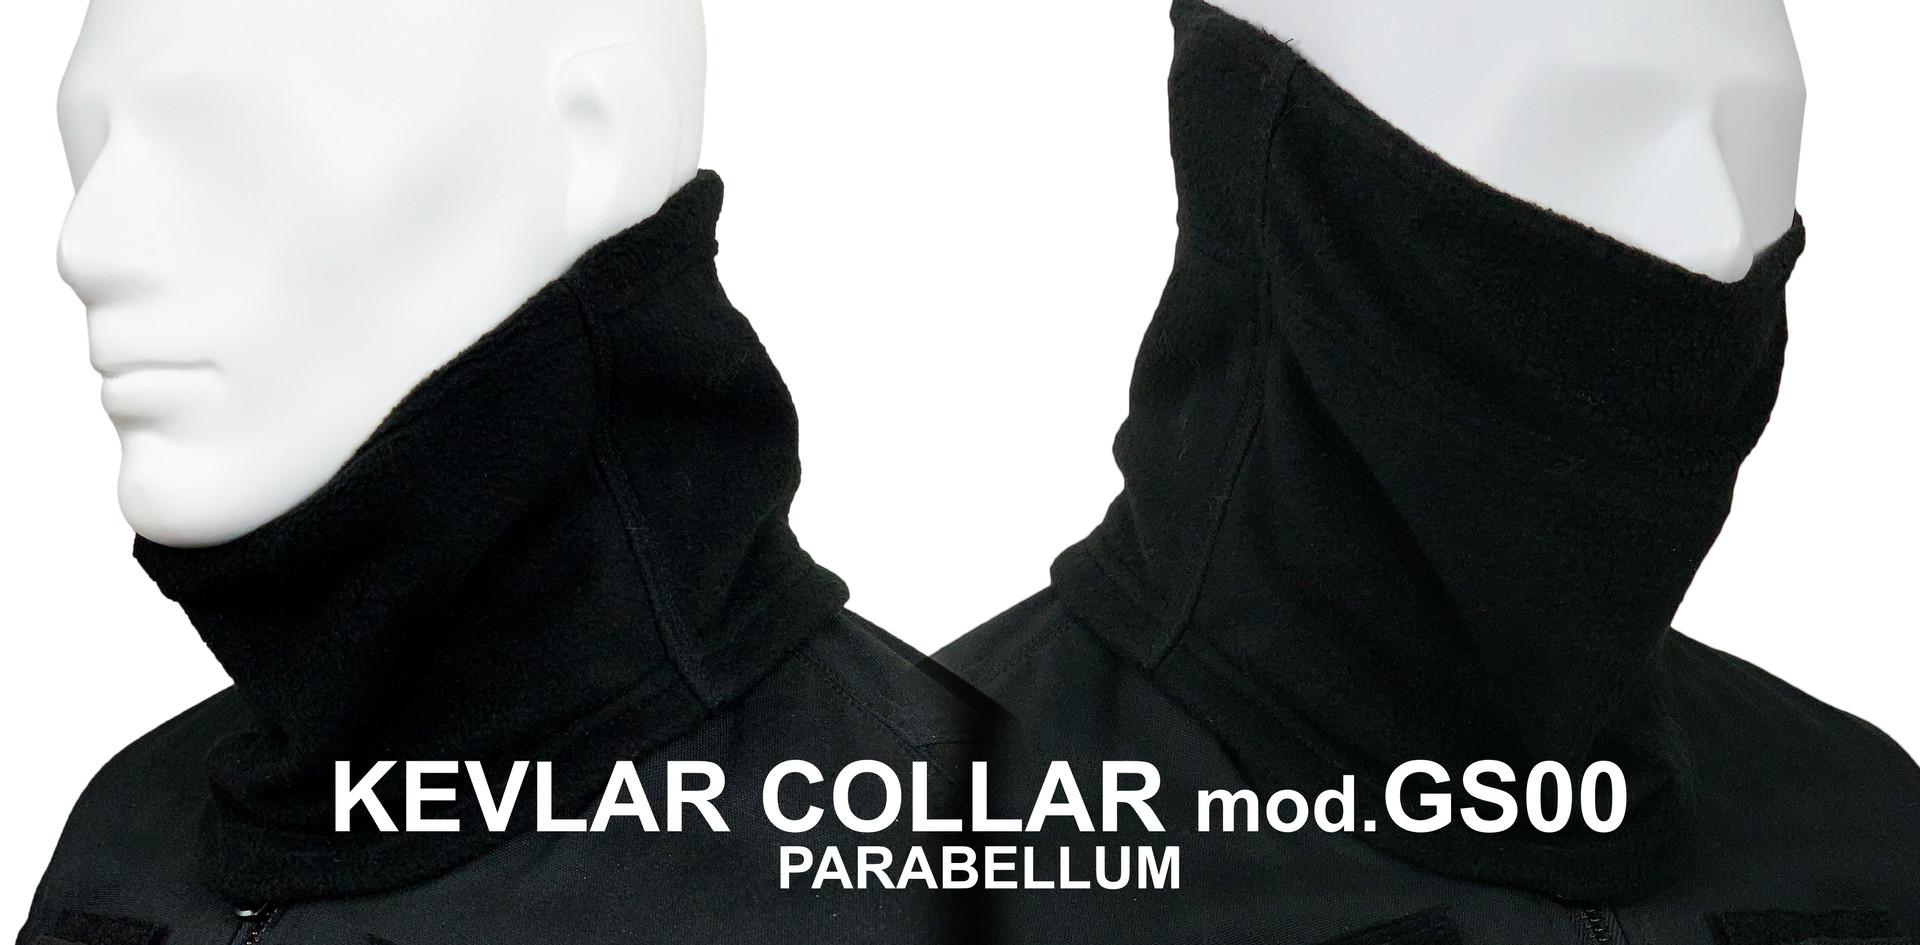 Gattopardo Parabellum Kevlar Jacket KEVLAR COLLAR